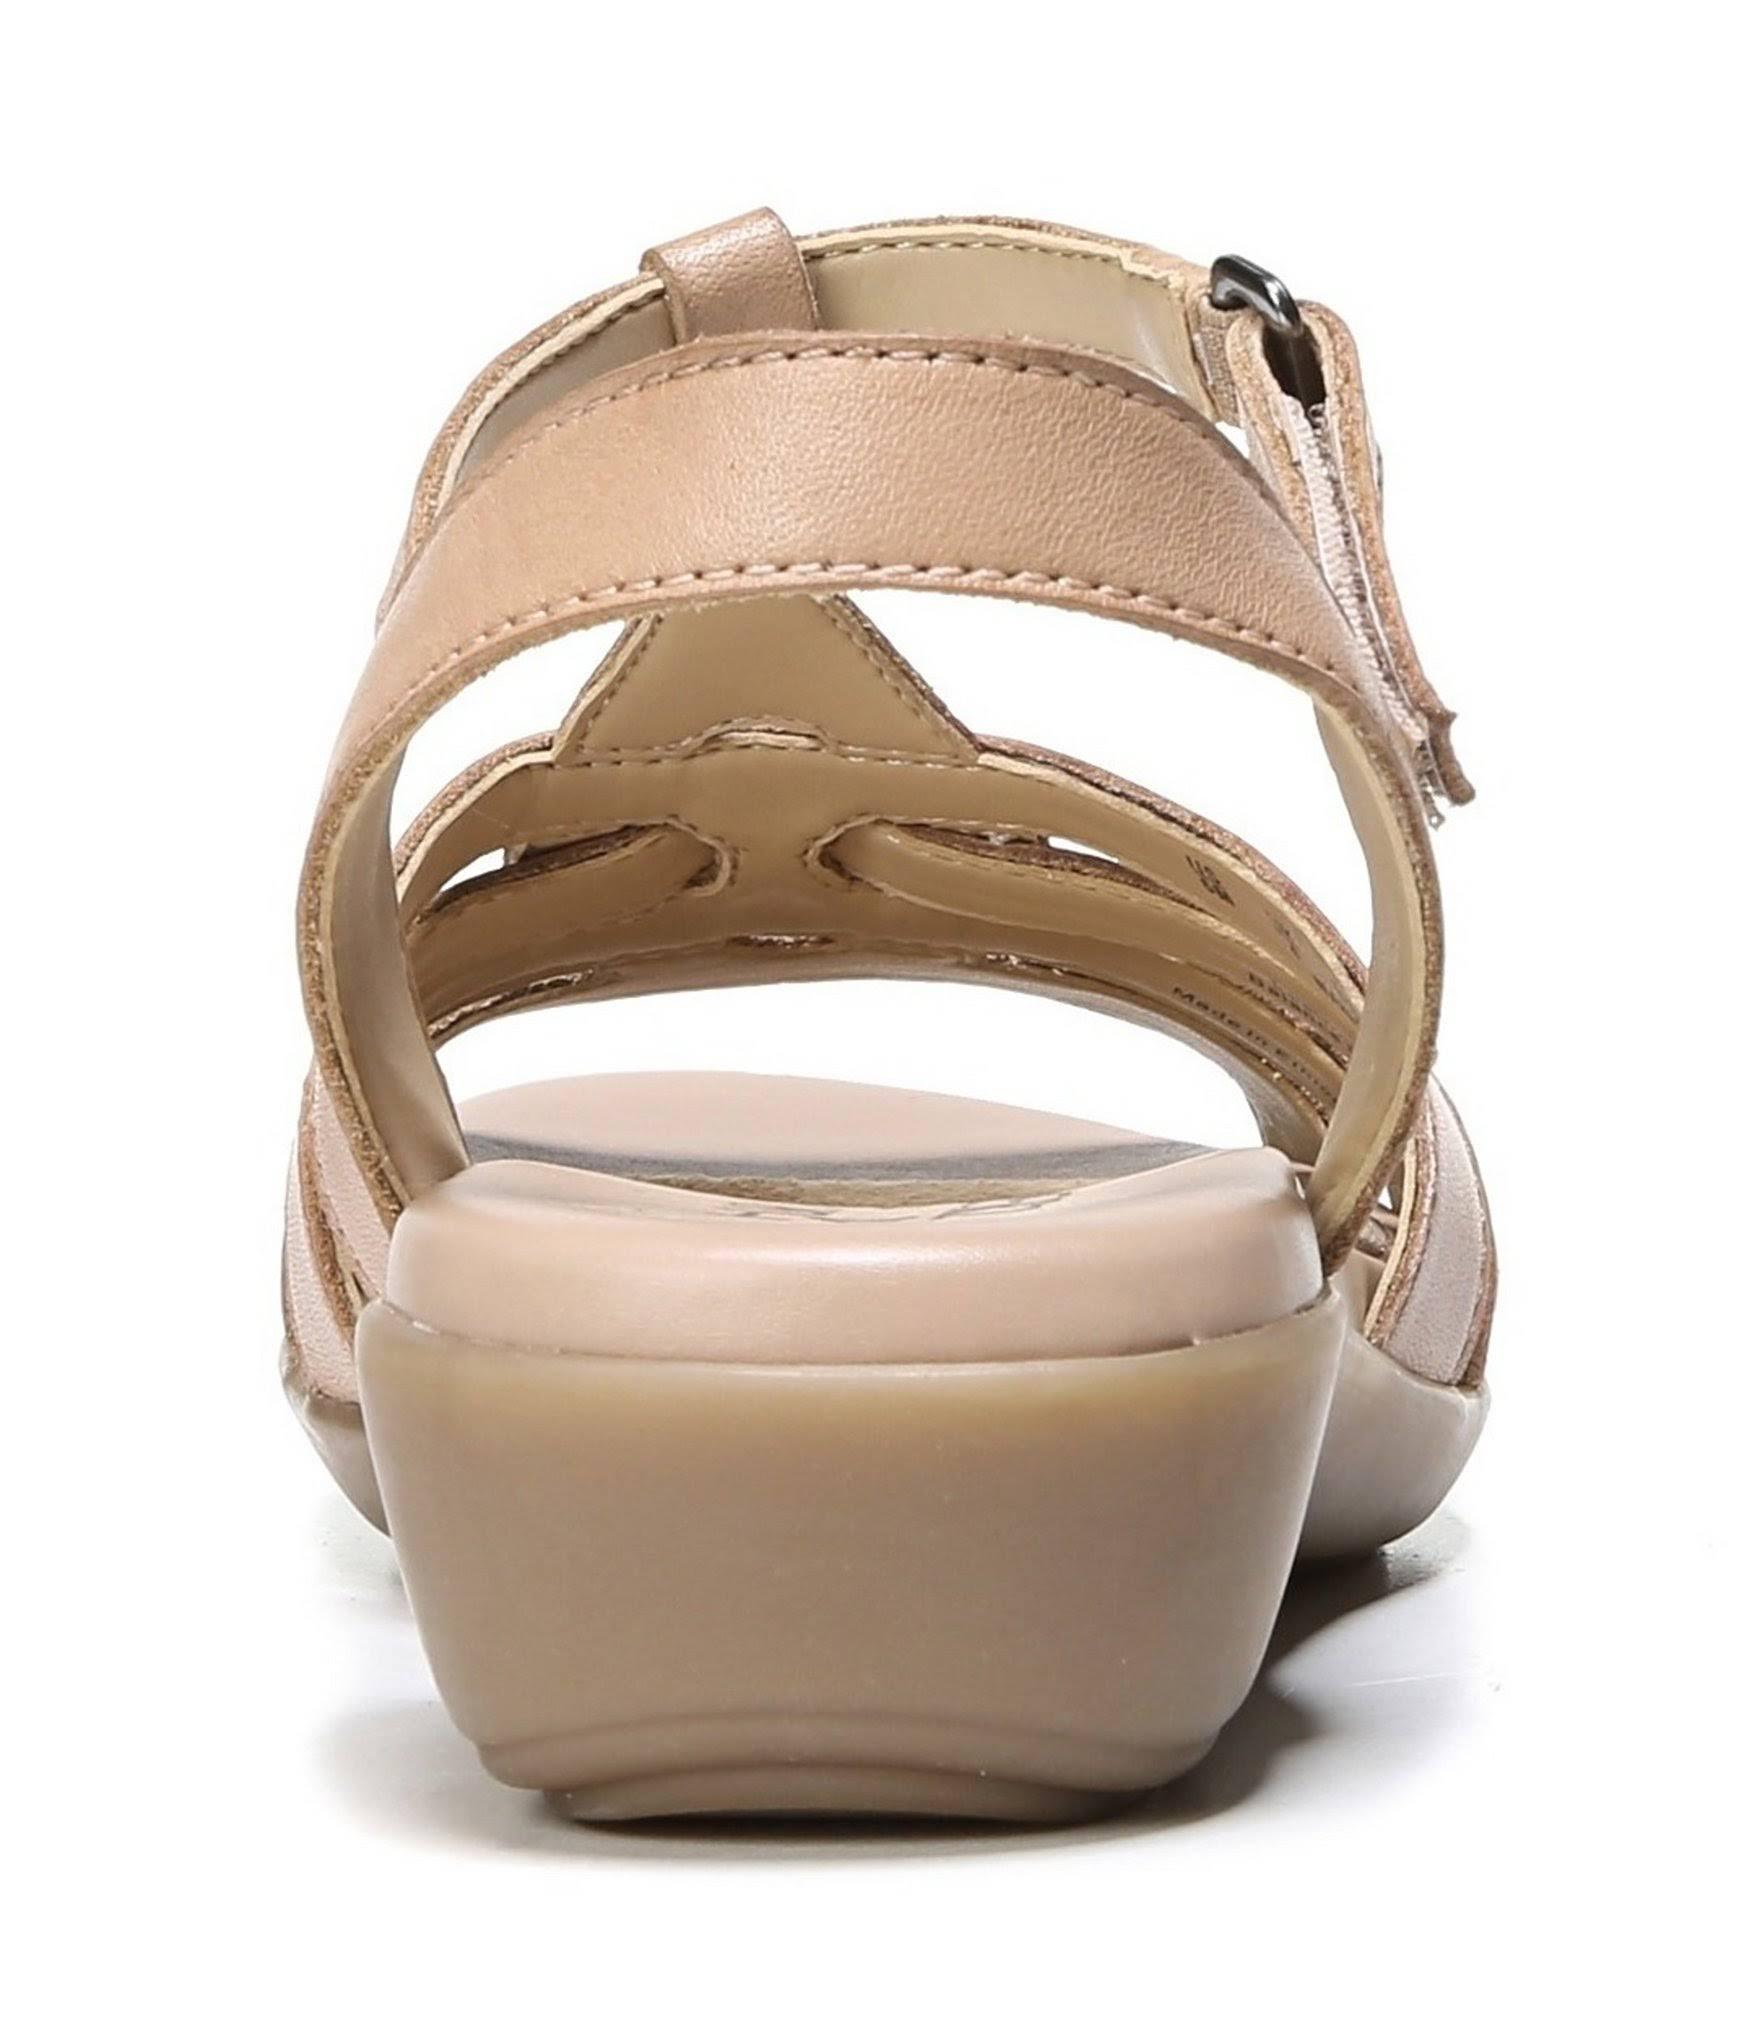 MBeige Sandalo NaturalizerTaglia 10 Da Donna Nanci PuOZikX